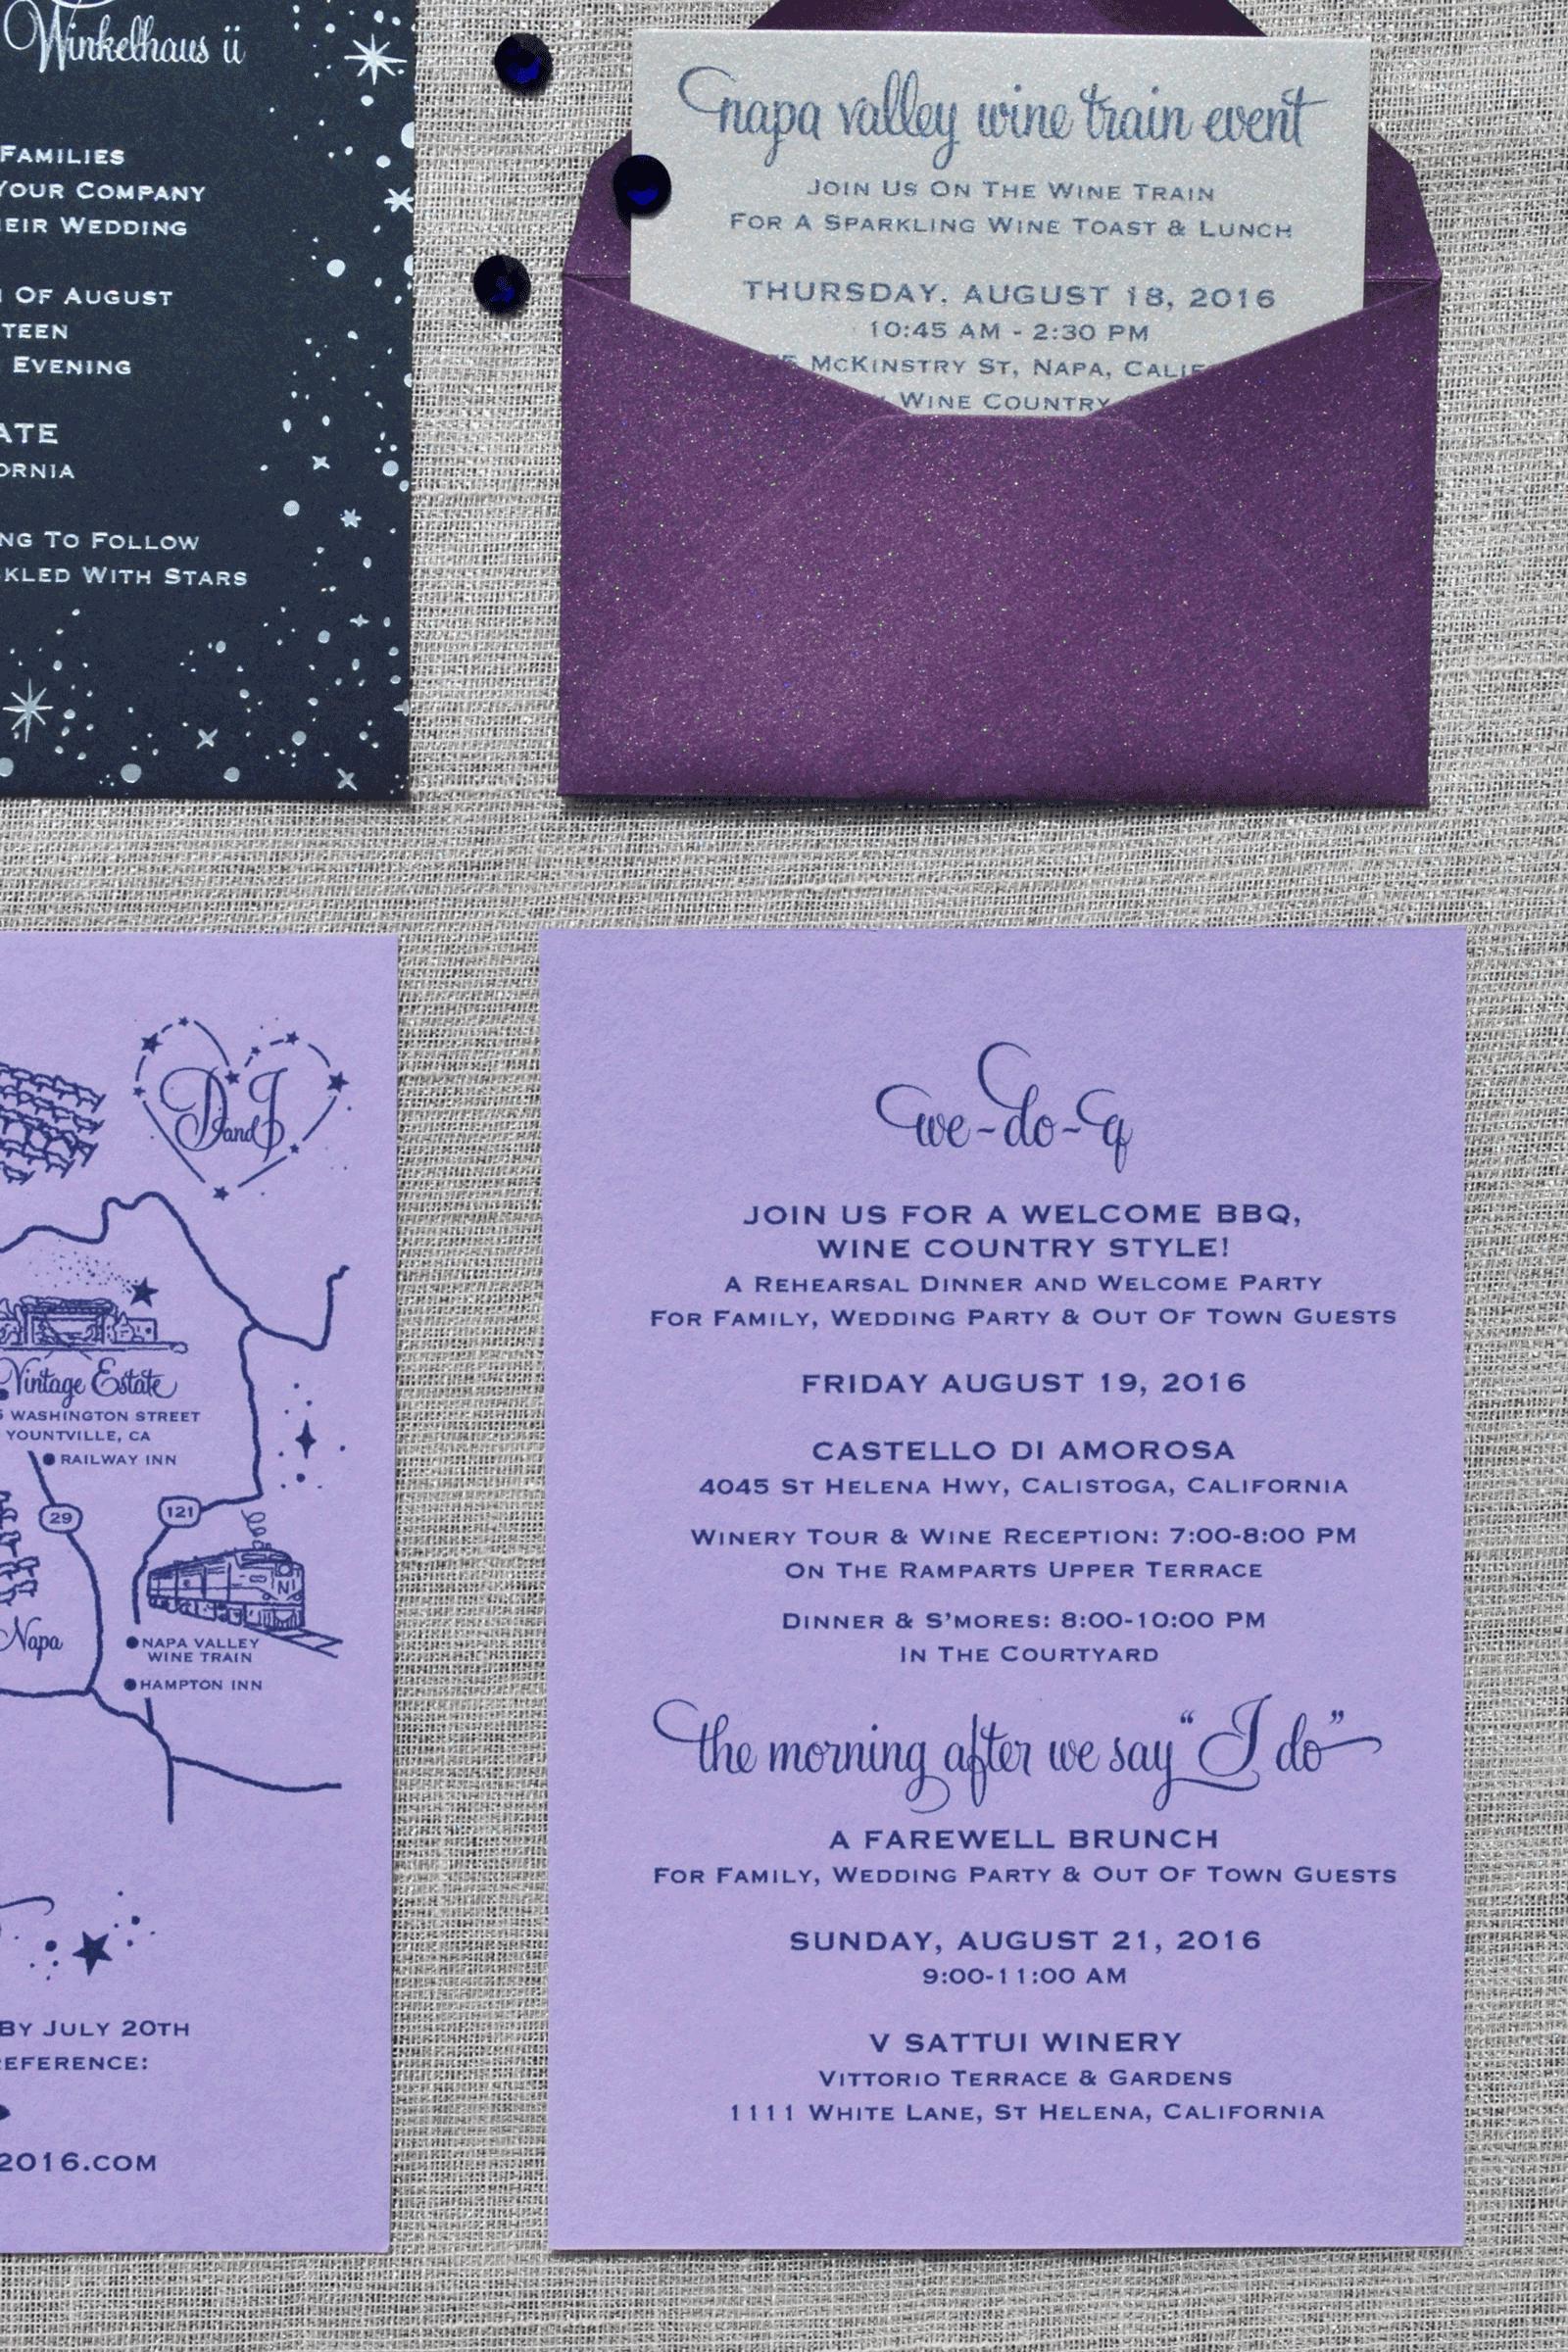 TLW_Stirling_InvitationInsert.png